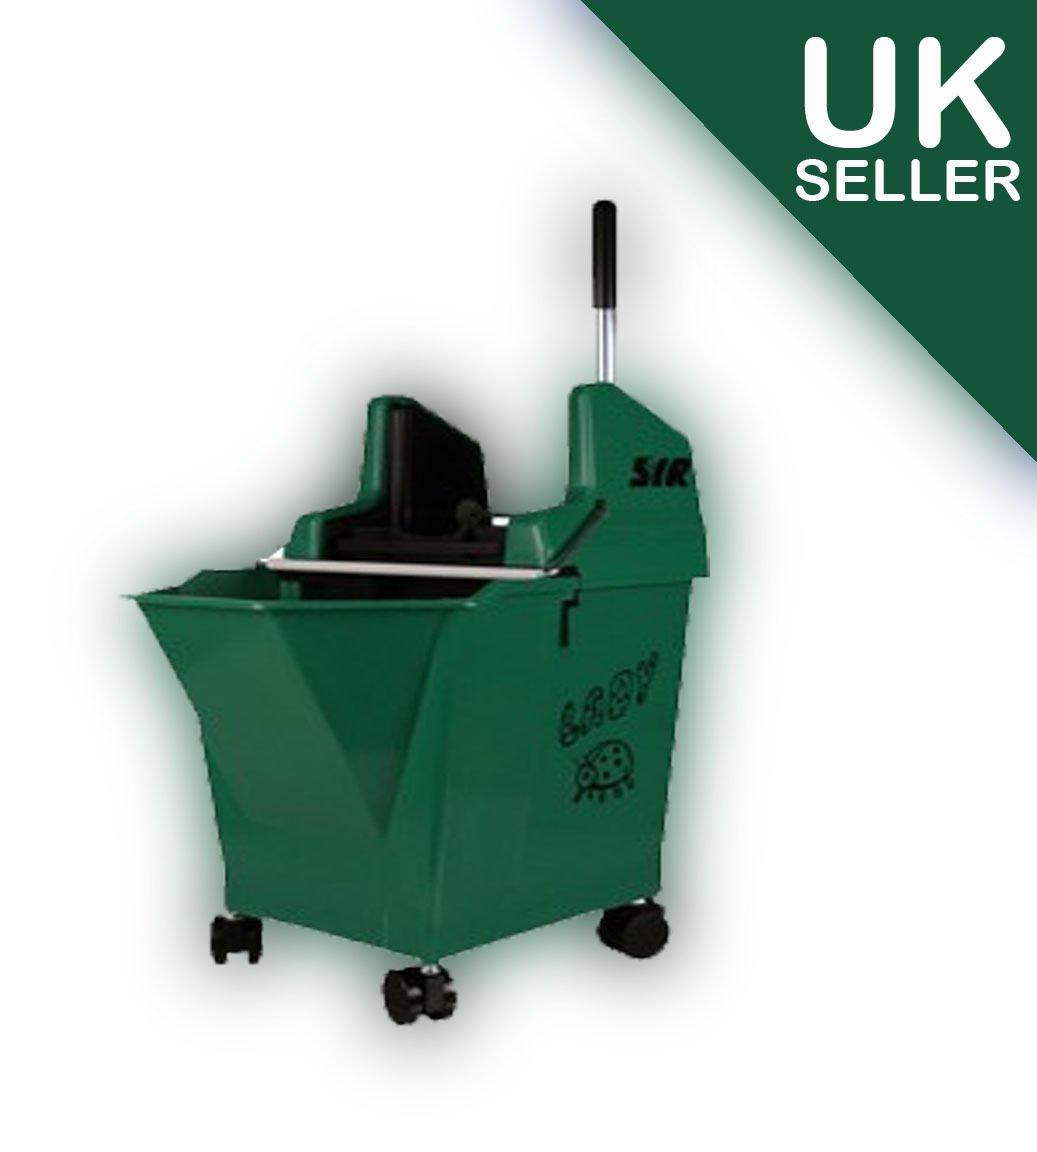 Professional SYR Kentucky Lady Mop Bucket (Green) on Castors